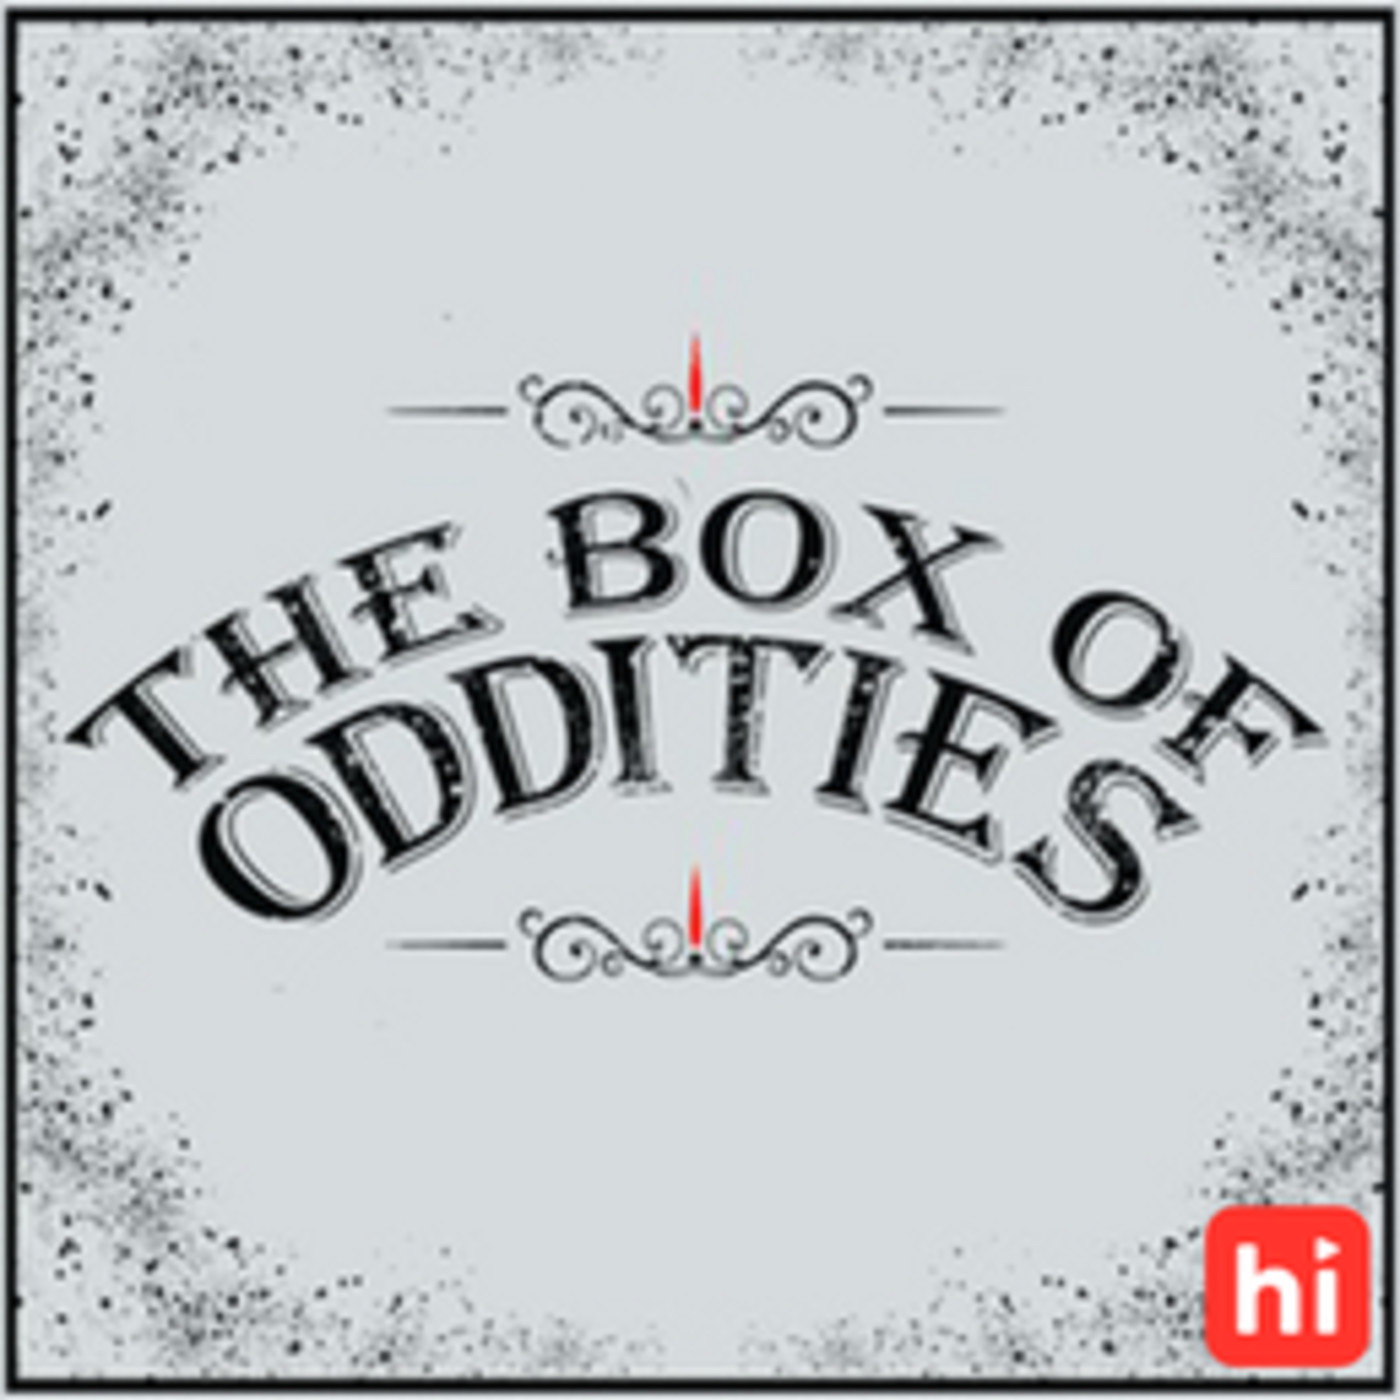 BOX216: Posthumous Spam